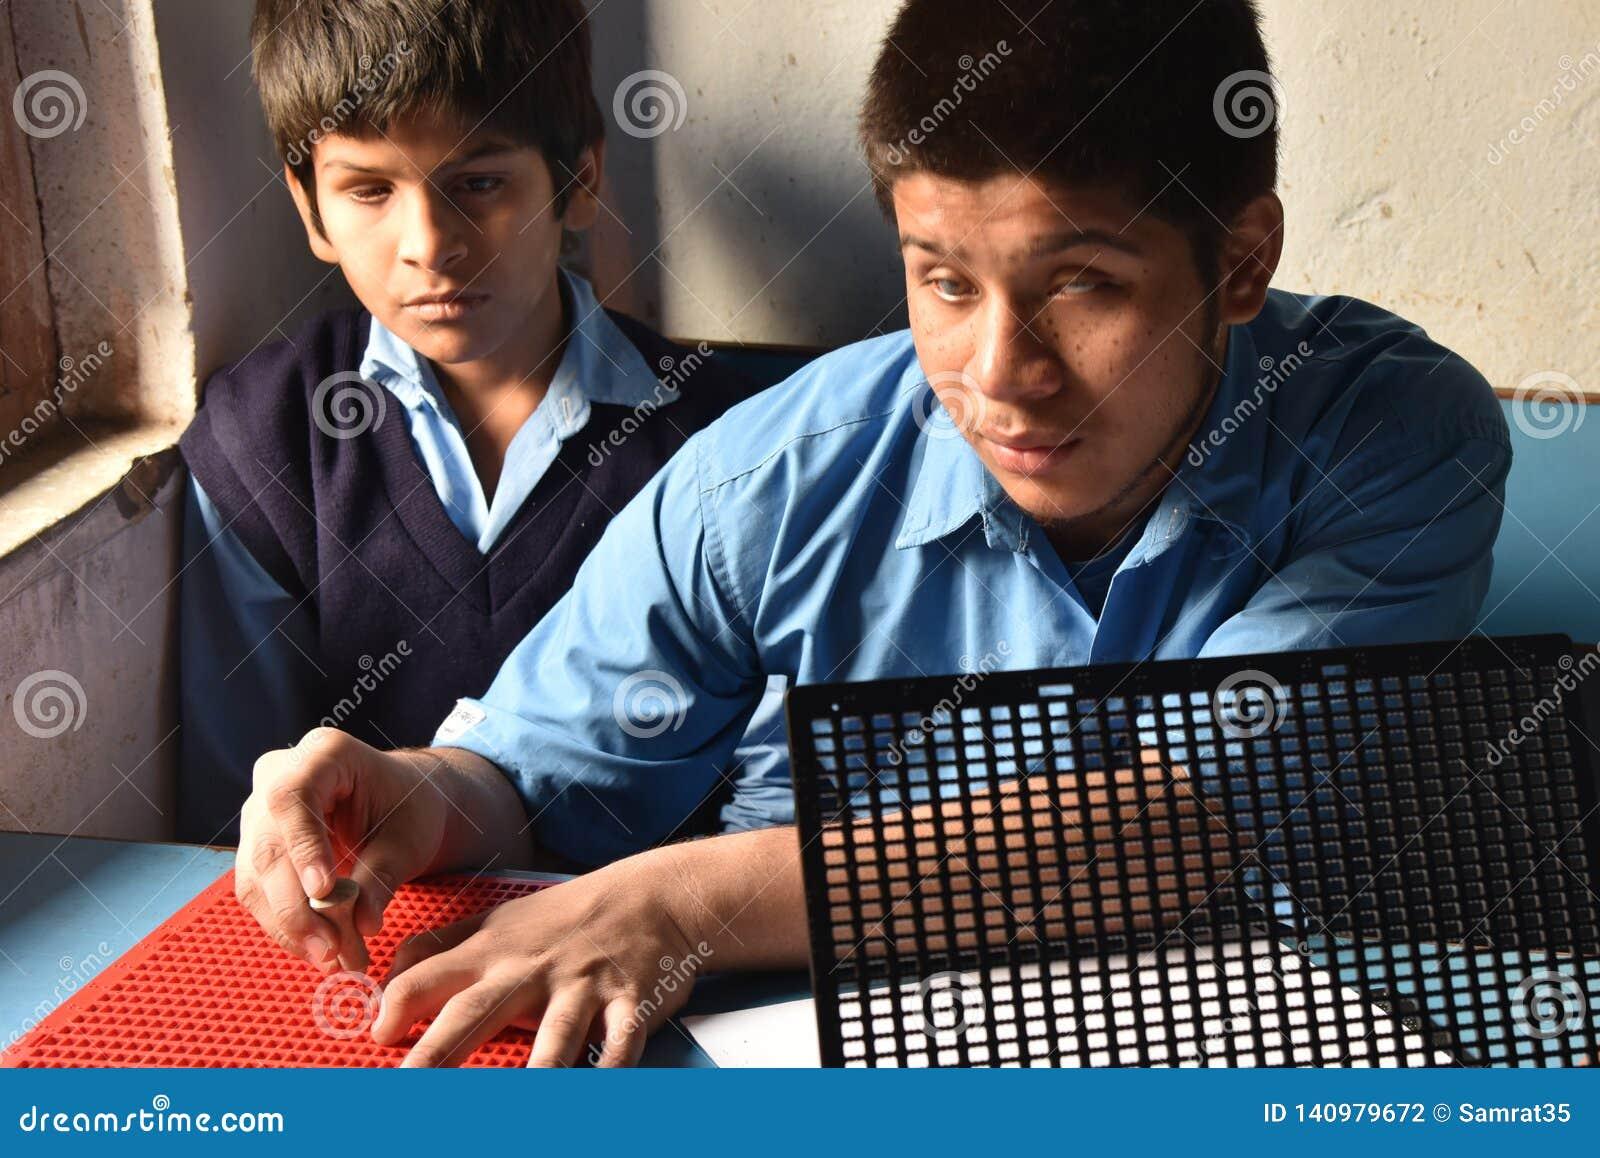 Louis Braille-Blind School In India